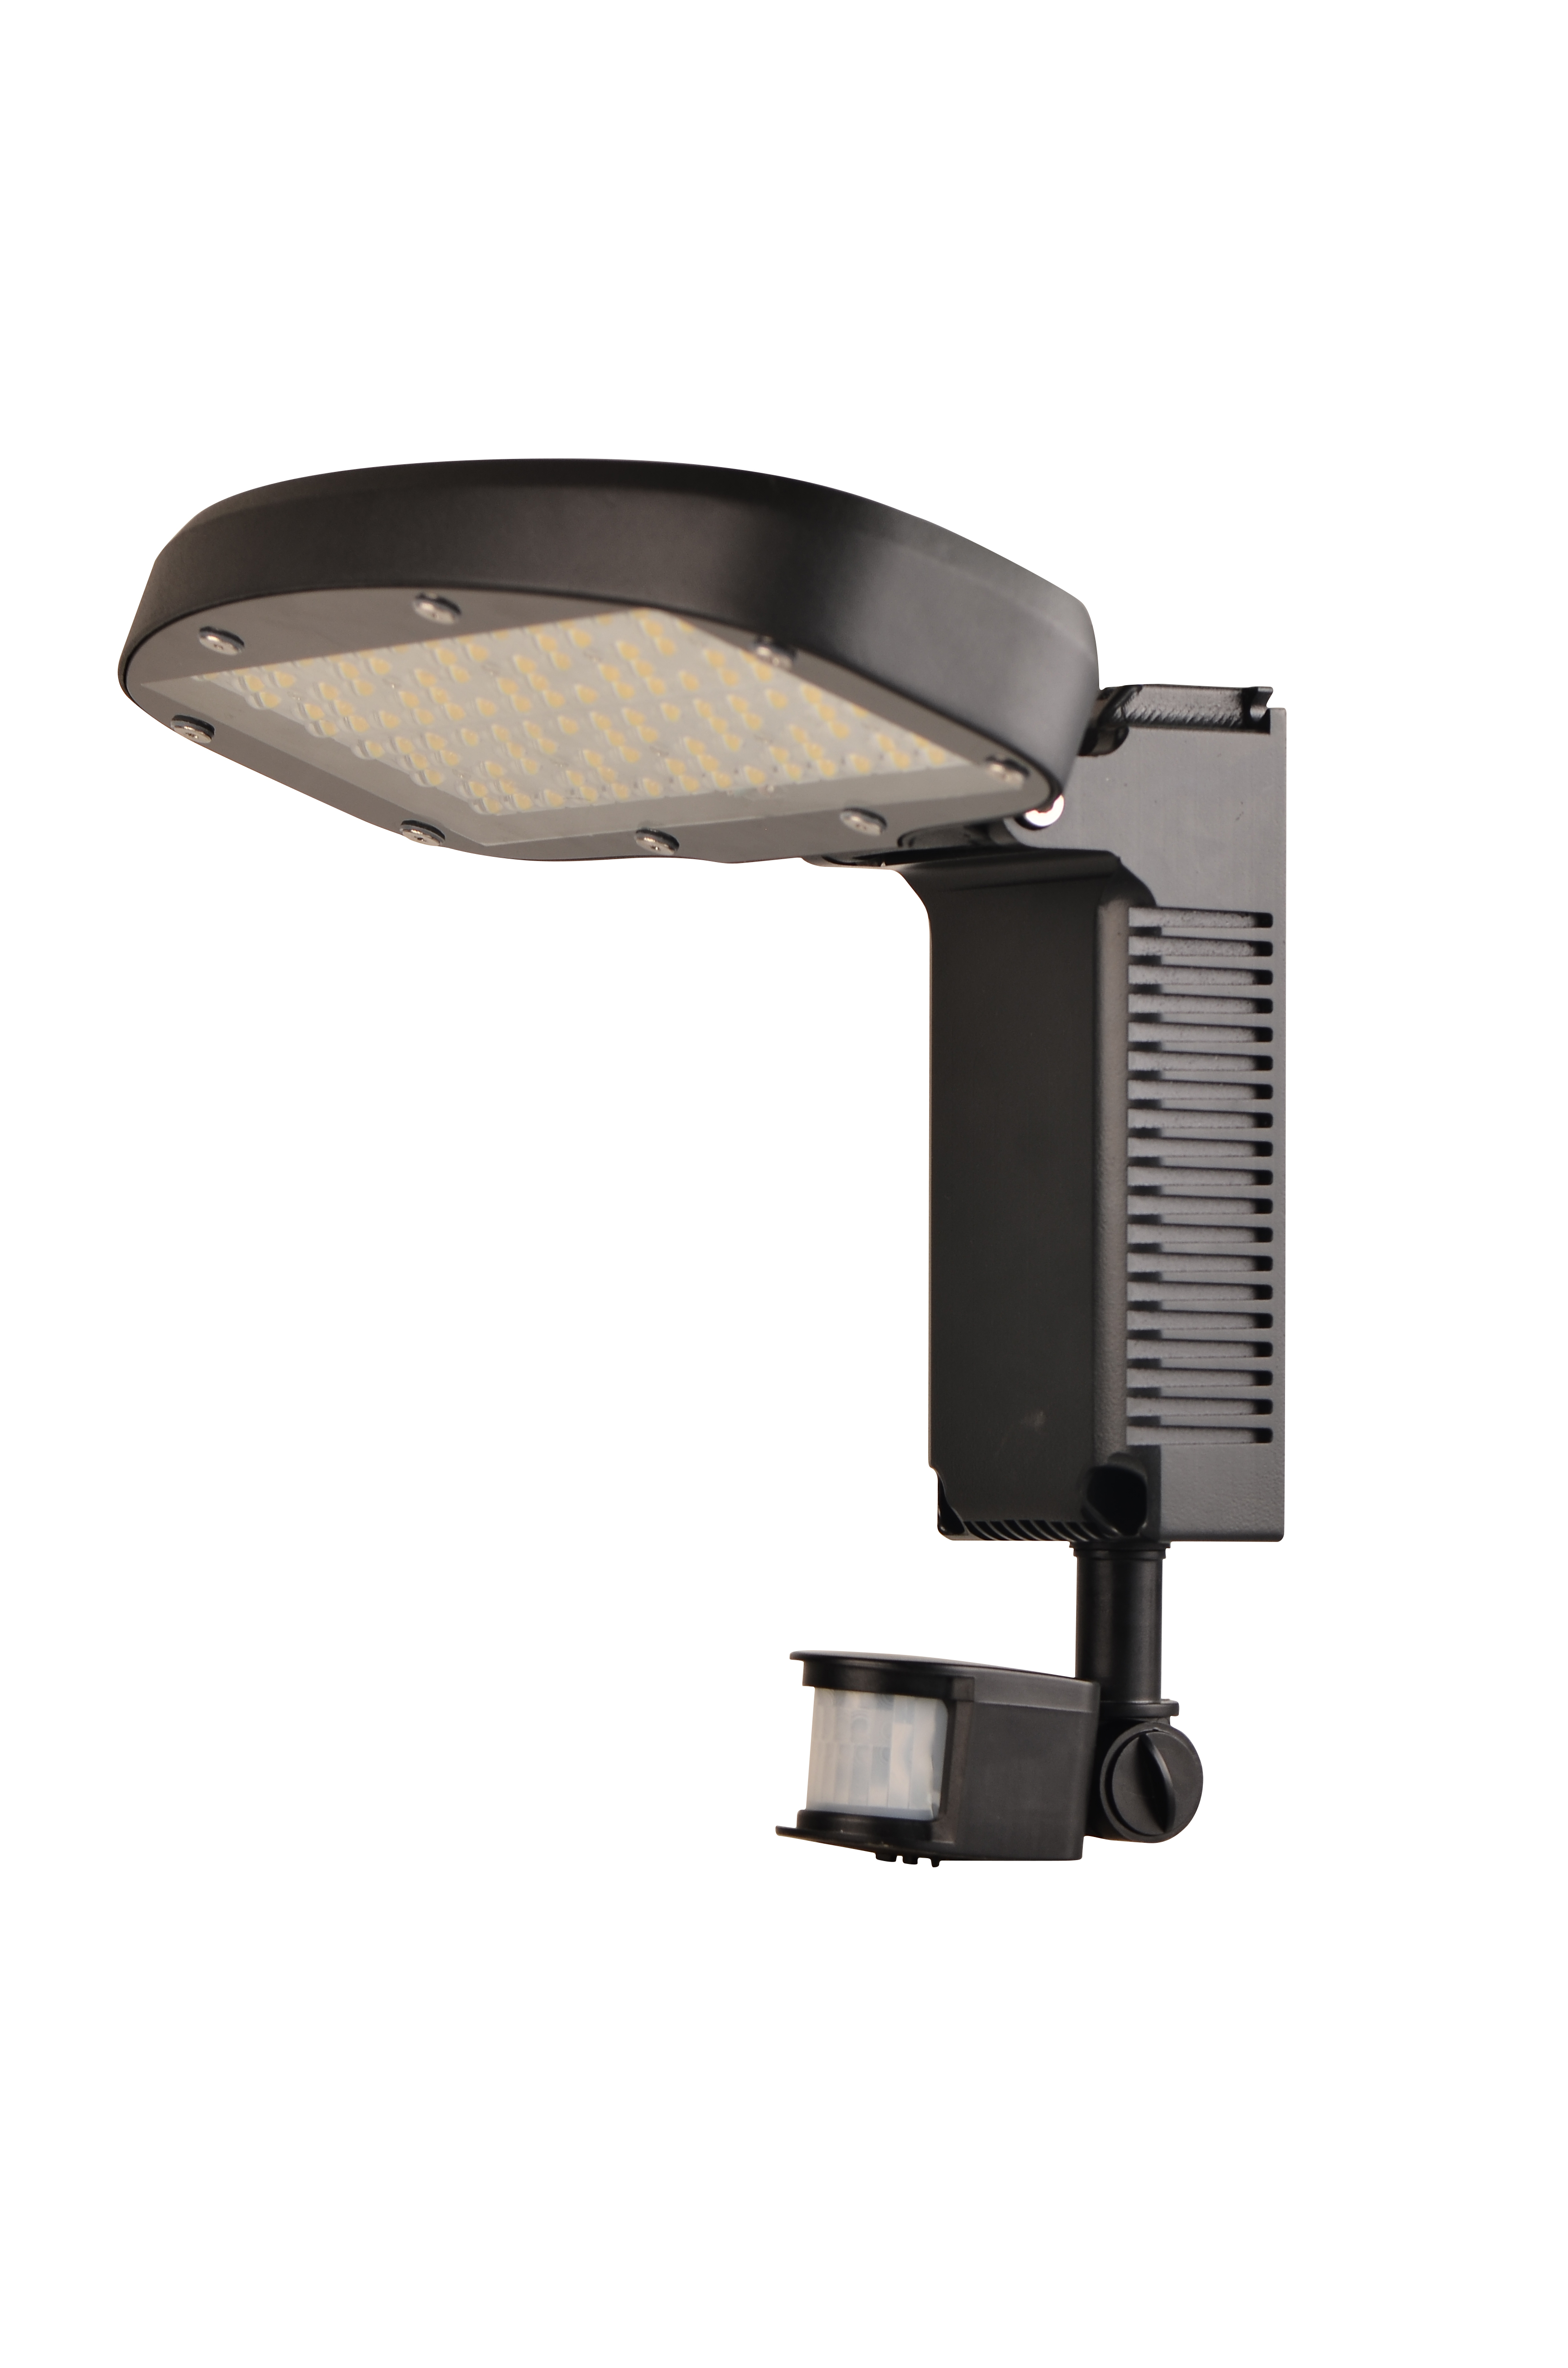 100w Led Wallpack Light With Sensor Okaybulb